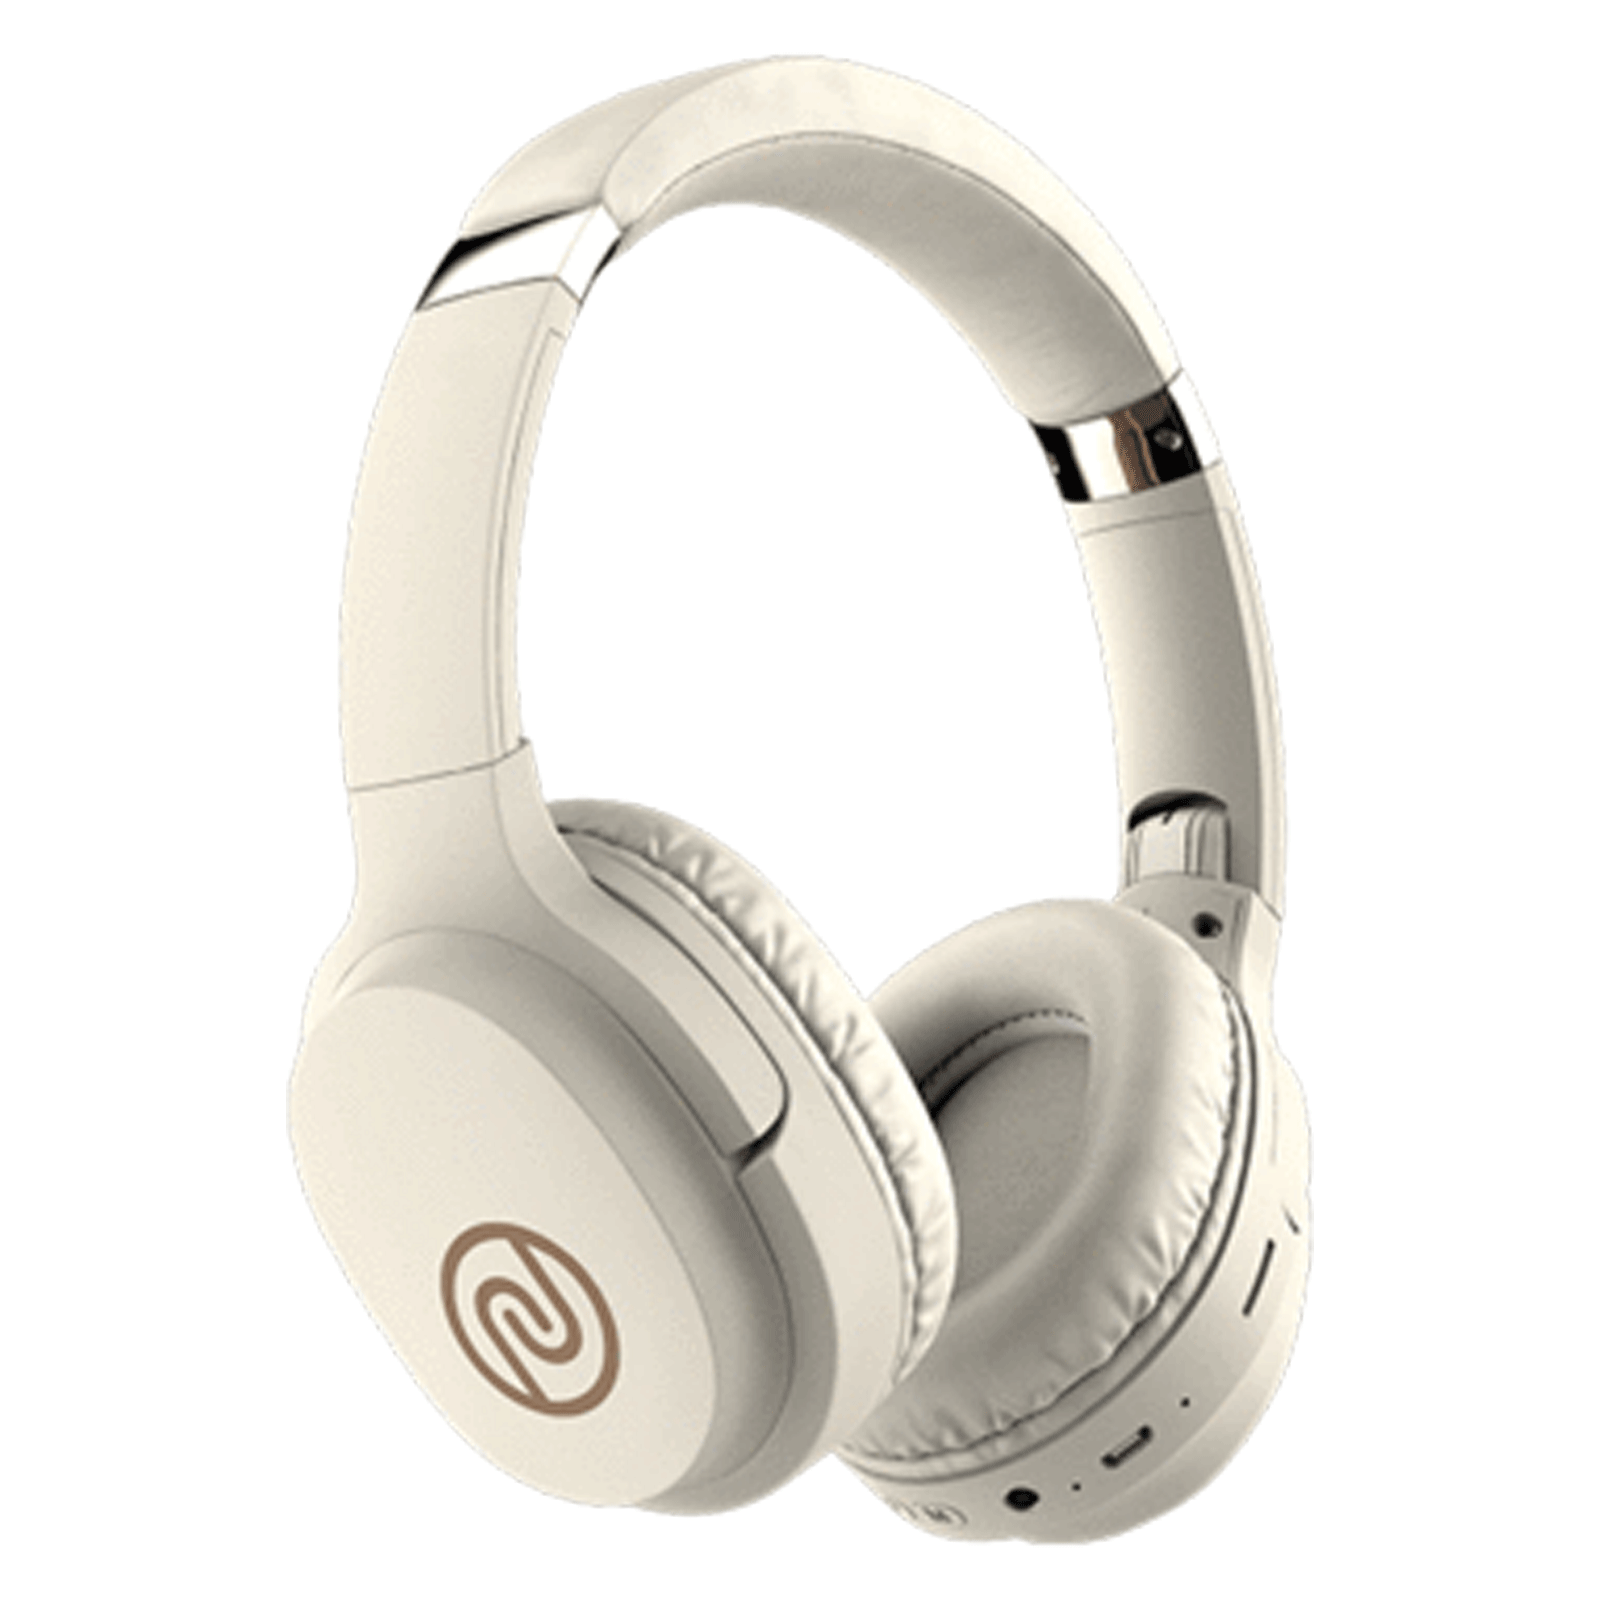 Noise One On-Ear Noise Isolation Wireless Headphone with Mic (Bluetooth 5.0, Tru BassTM Technology, Warm Beige)_1